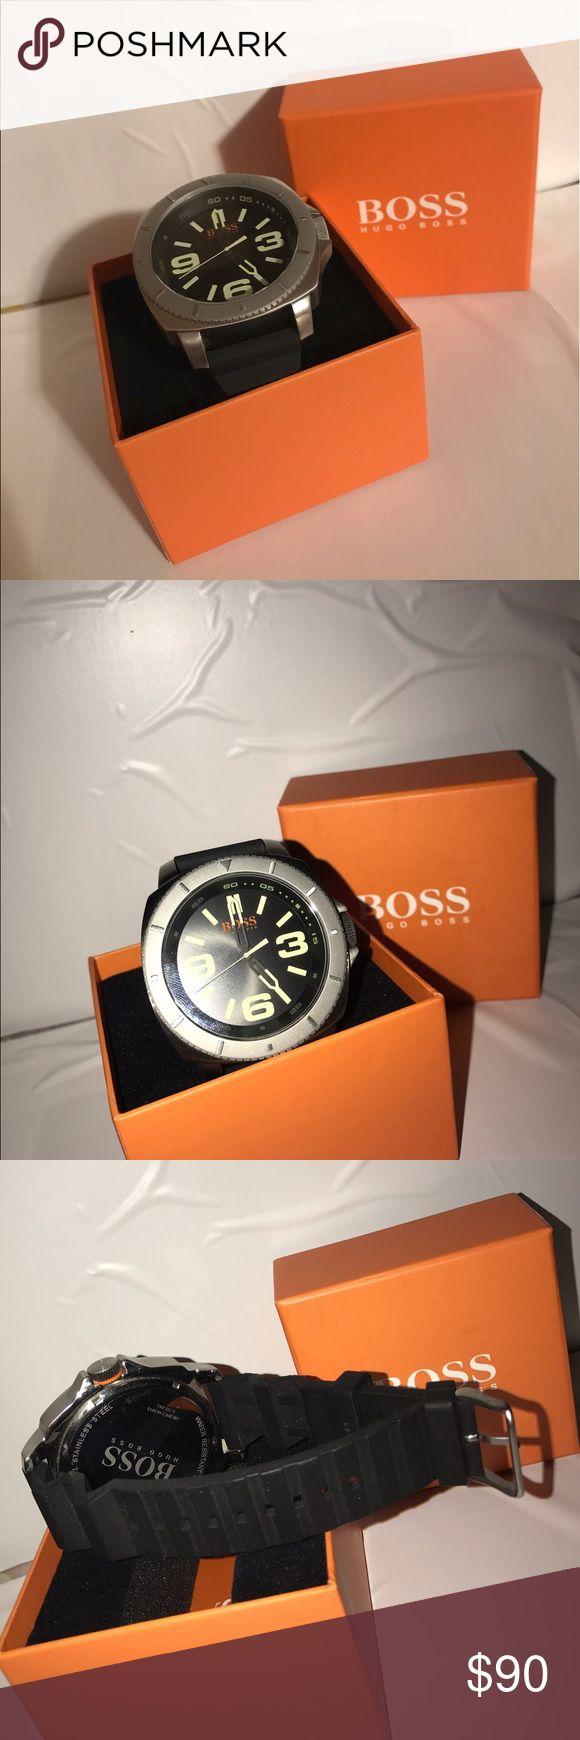 Hugo boss Hugo boss watch Hugo Boss Accessories Watches